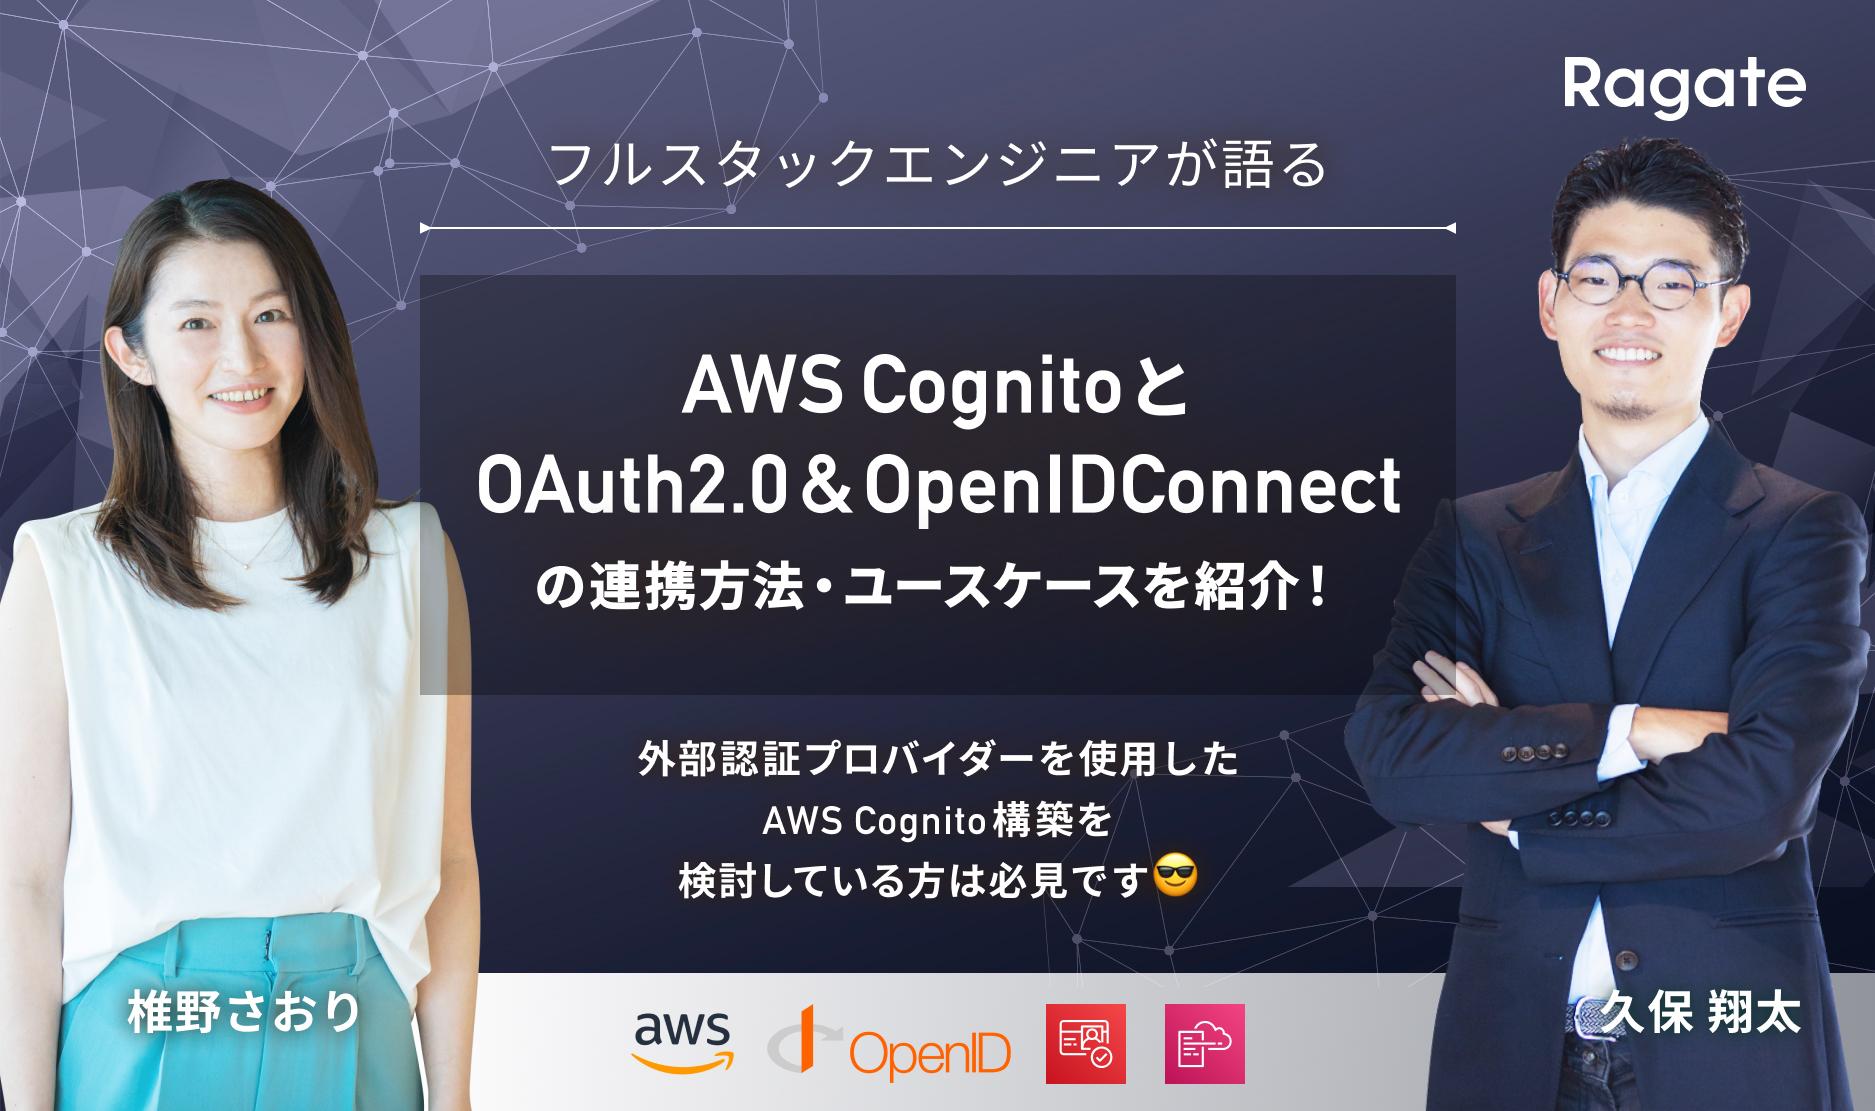 AWS CognitoとOAuth2.0/OpenIDConnectの連携方法・ユースケースを紹介!外部認証プロバイダーを使用したAWS Cognito構築を検討している方は必見です😎